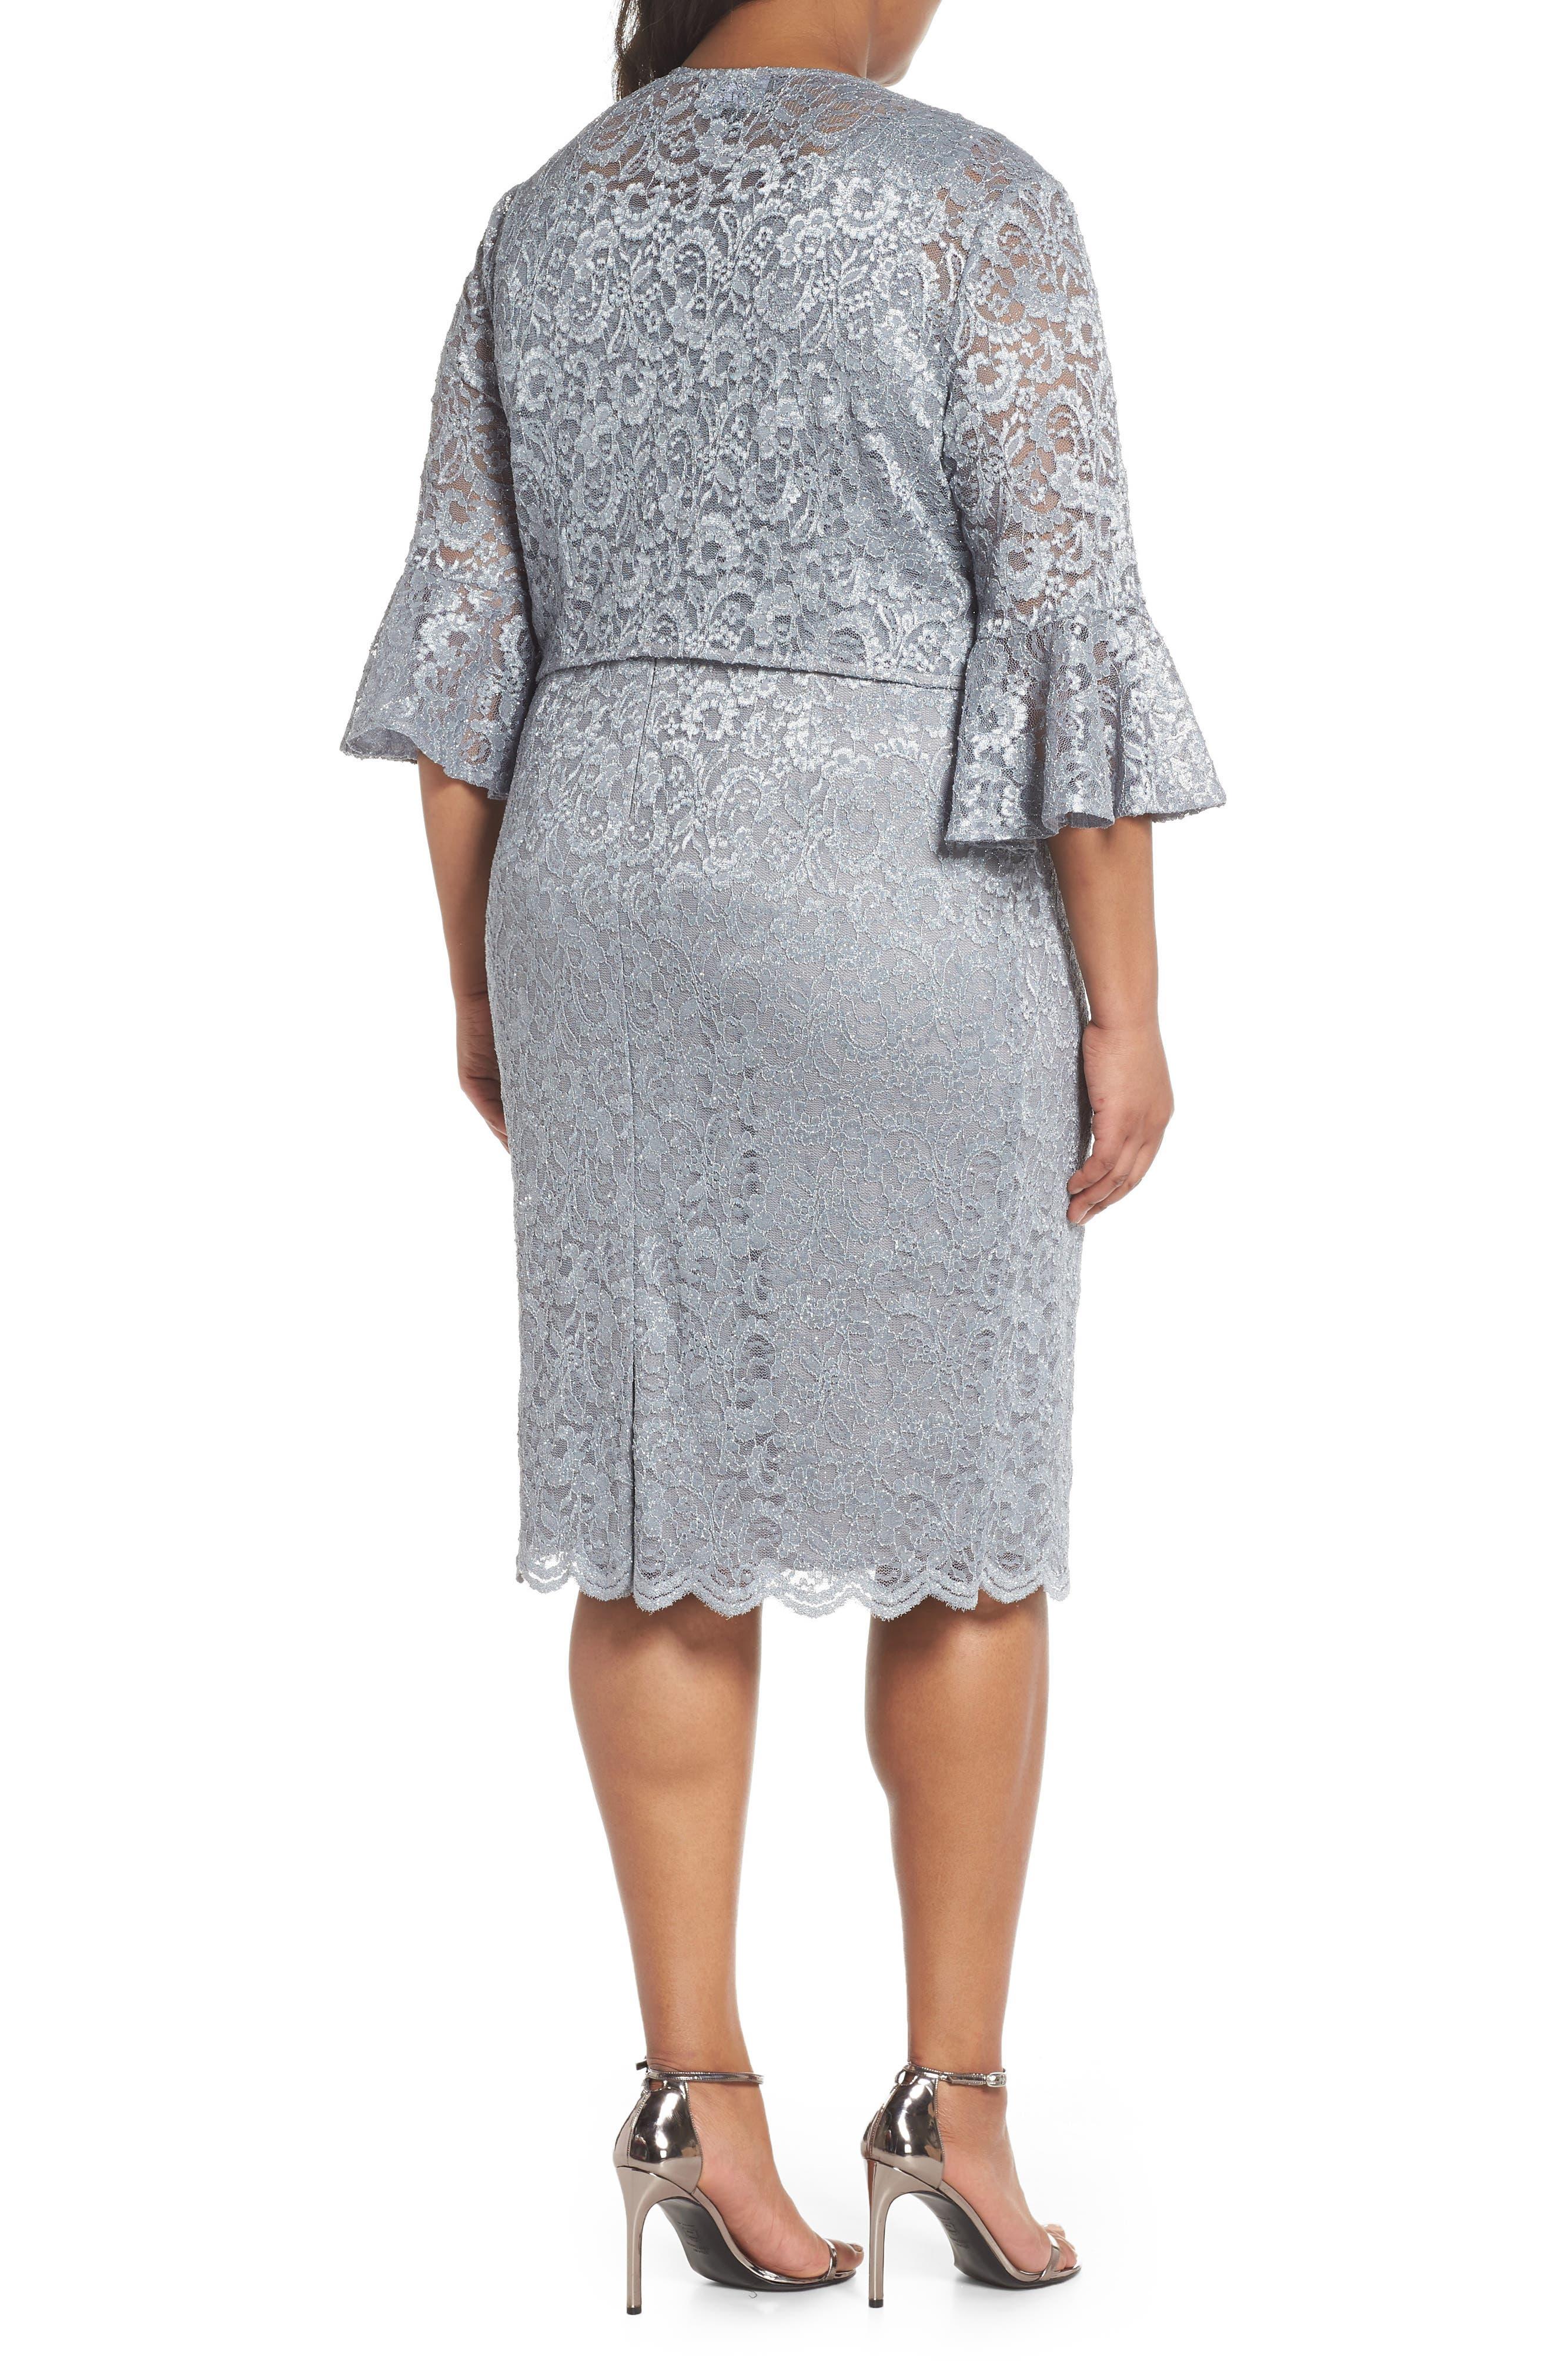 Lace Sheath Dress with Bolero Jacket,                             Alternate thumbnail 2, color,                             Silver